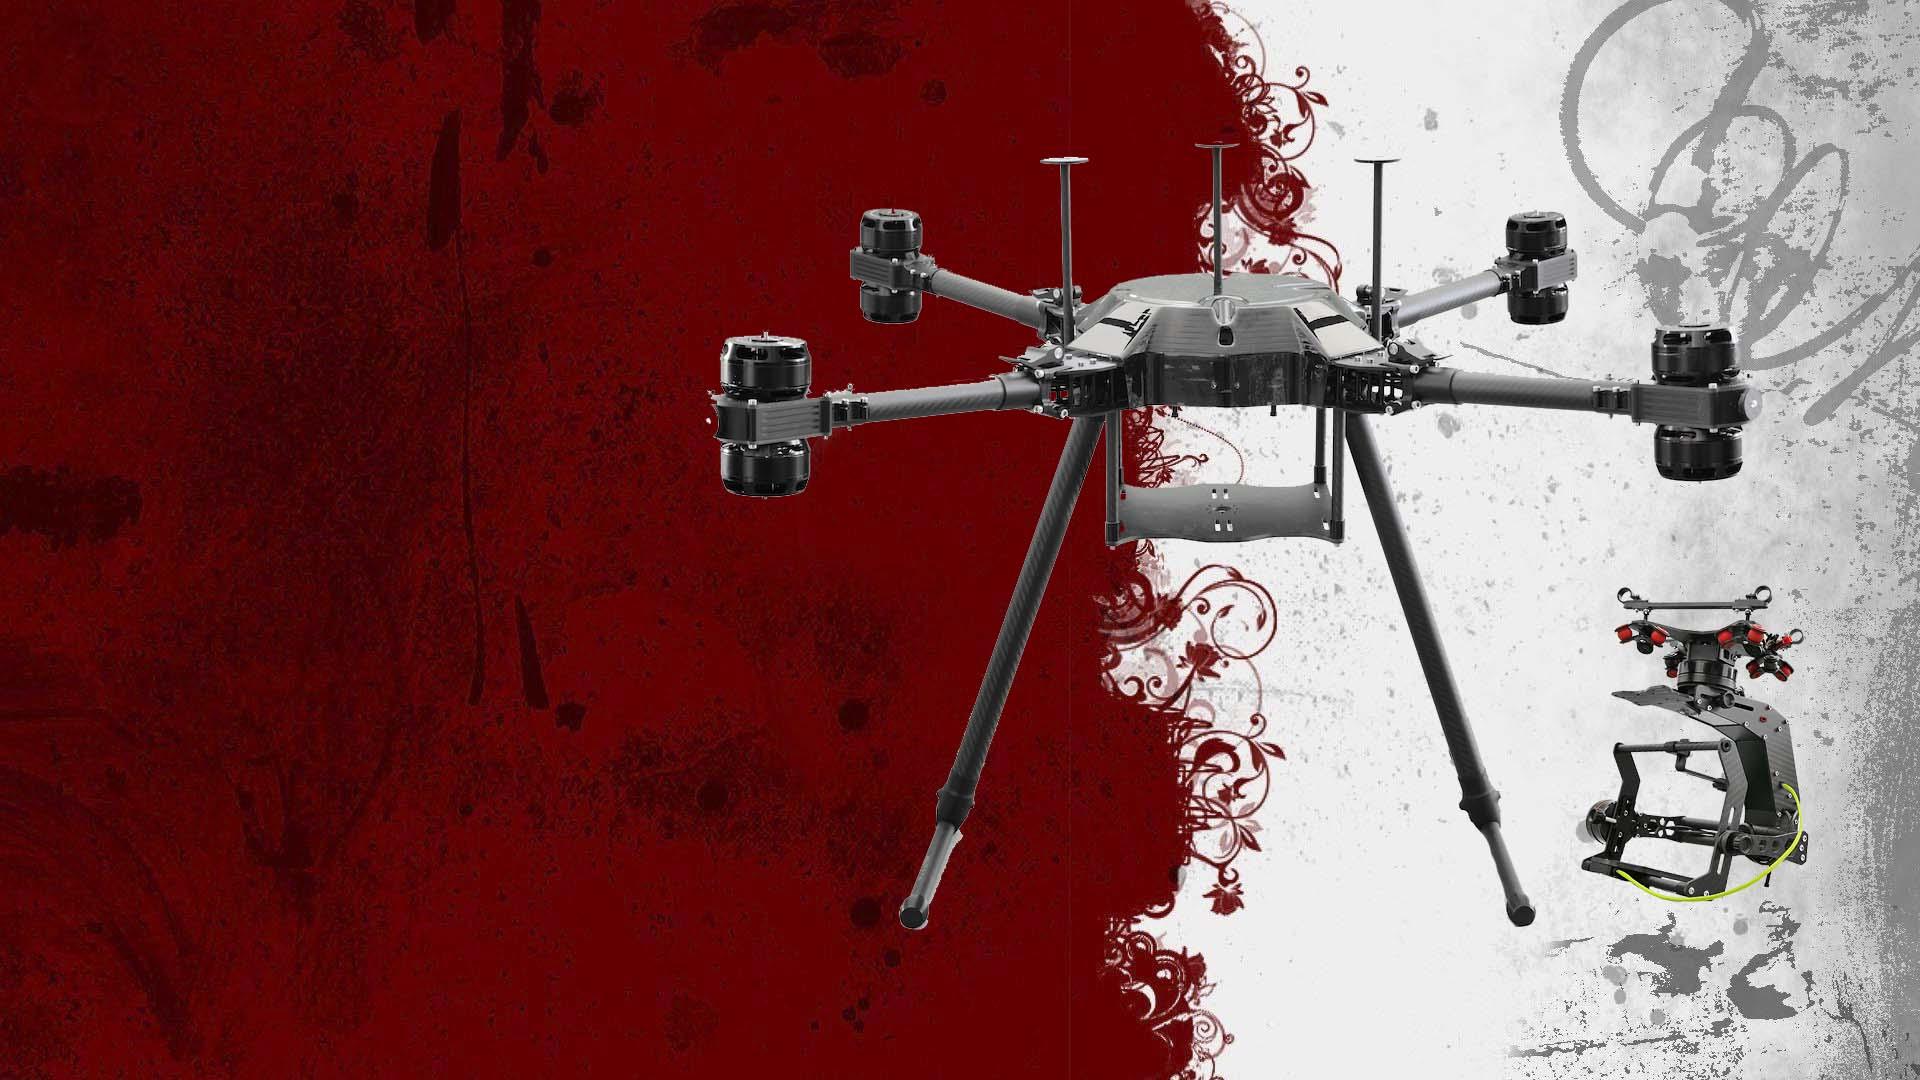 recon-air-x8pro1-drone-header3b